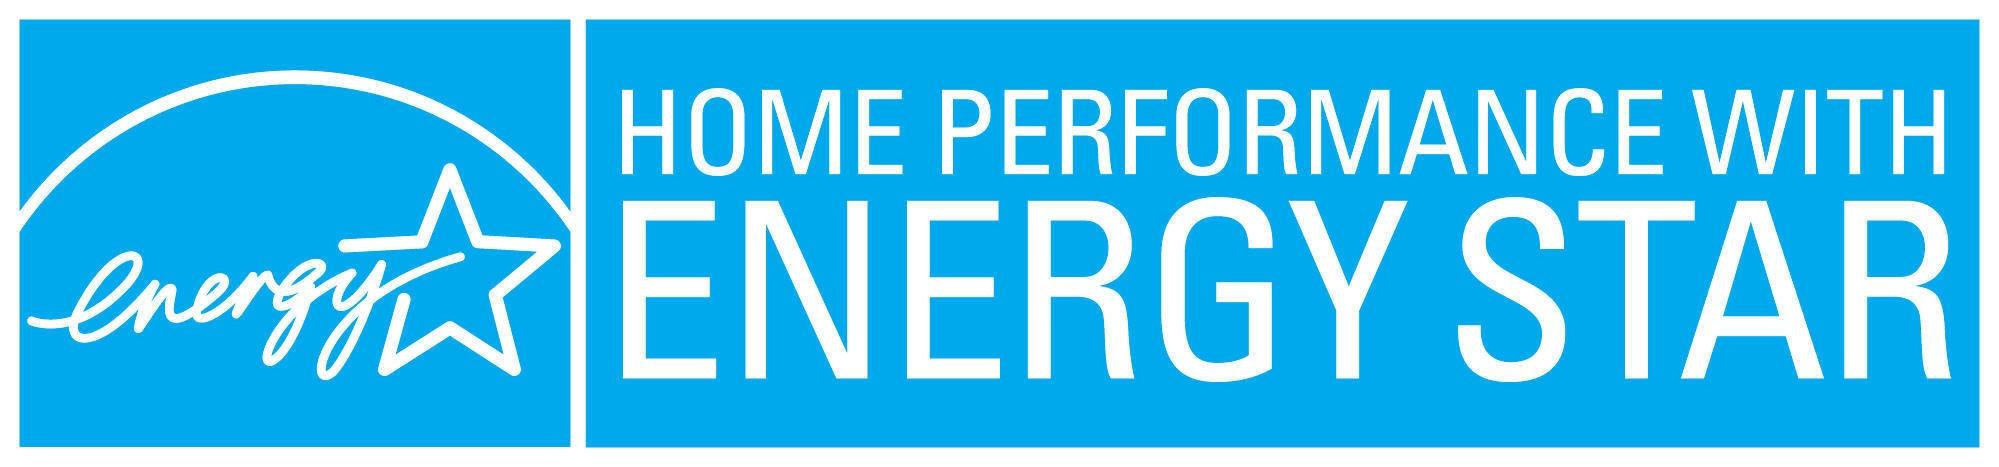 energystarperformance